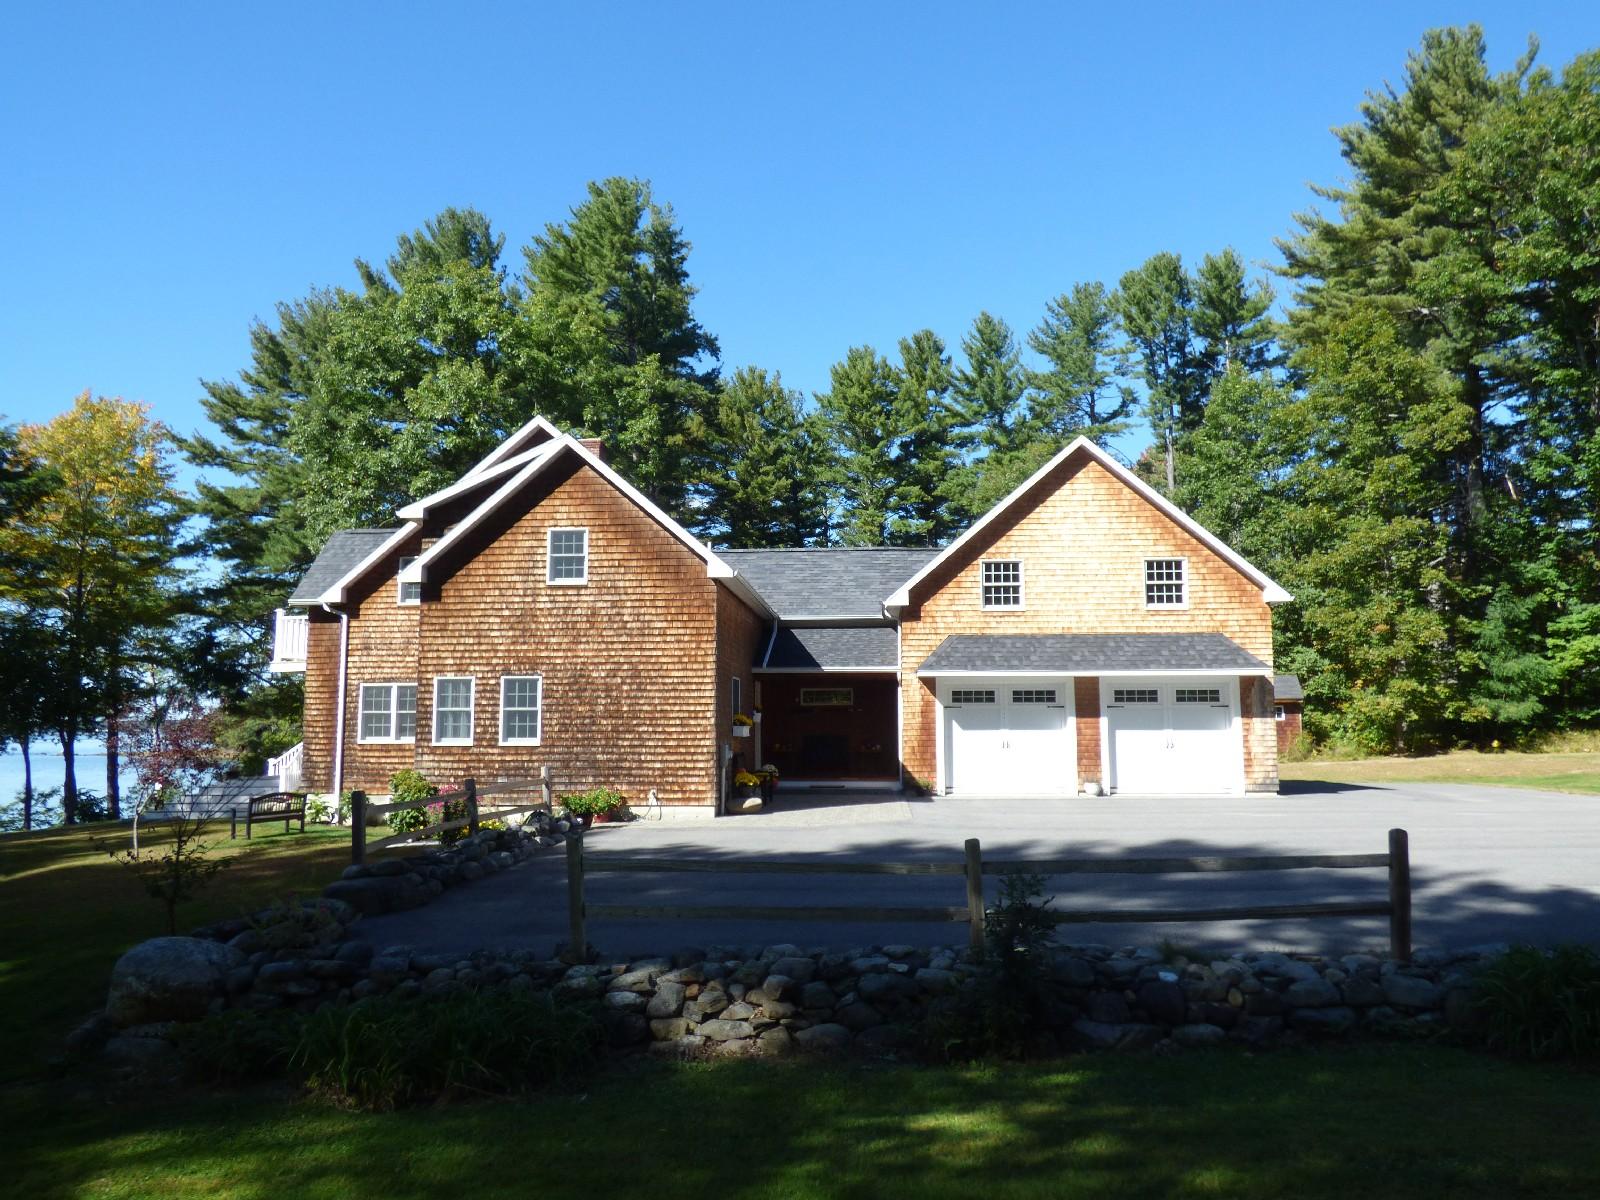 Single Family Home for Sale at Piscataqua Riverfront Shingle Style Home 36 Wisteria Lane Eliot, Maine 03903 United States